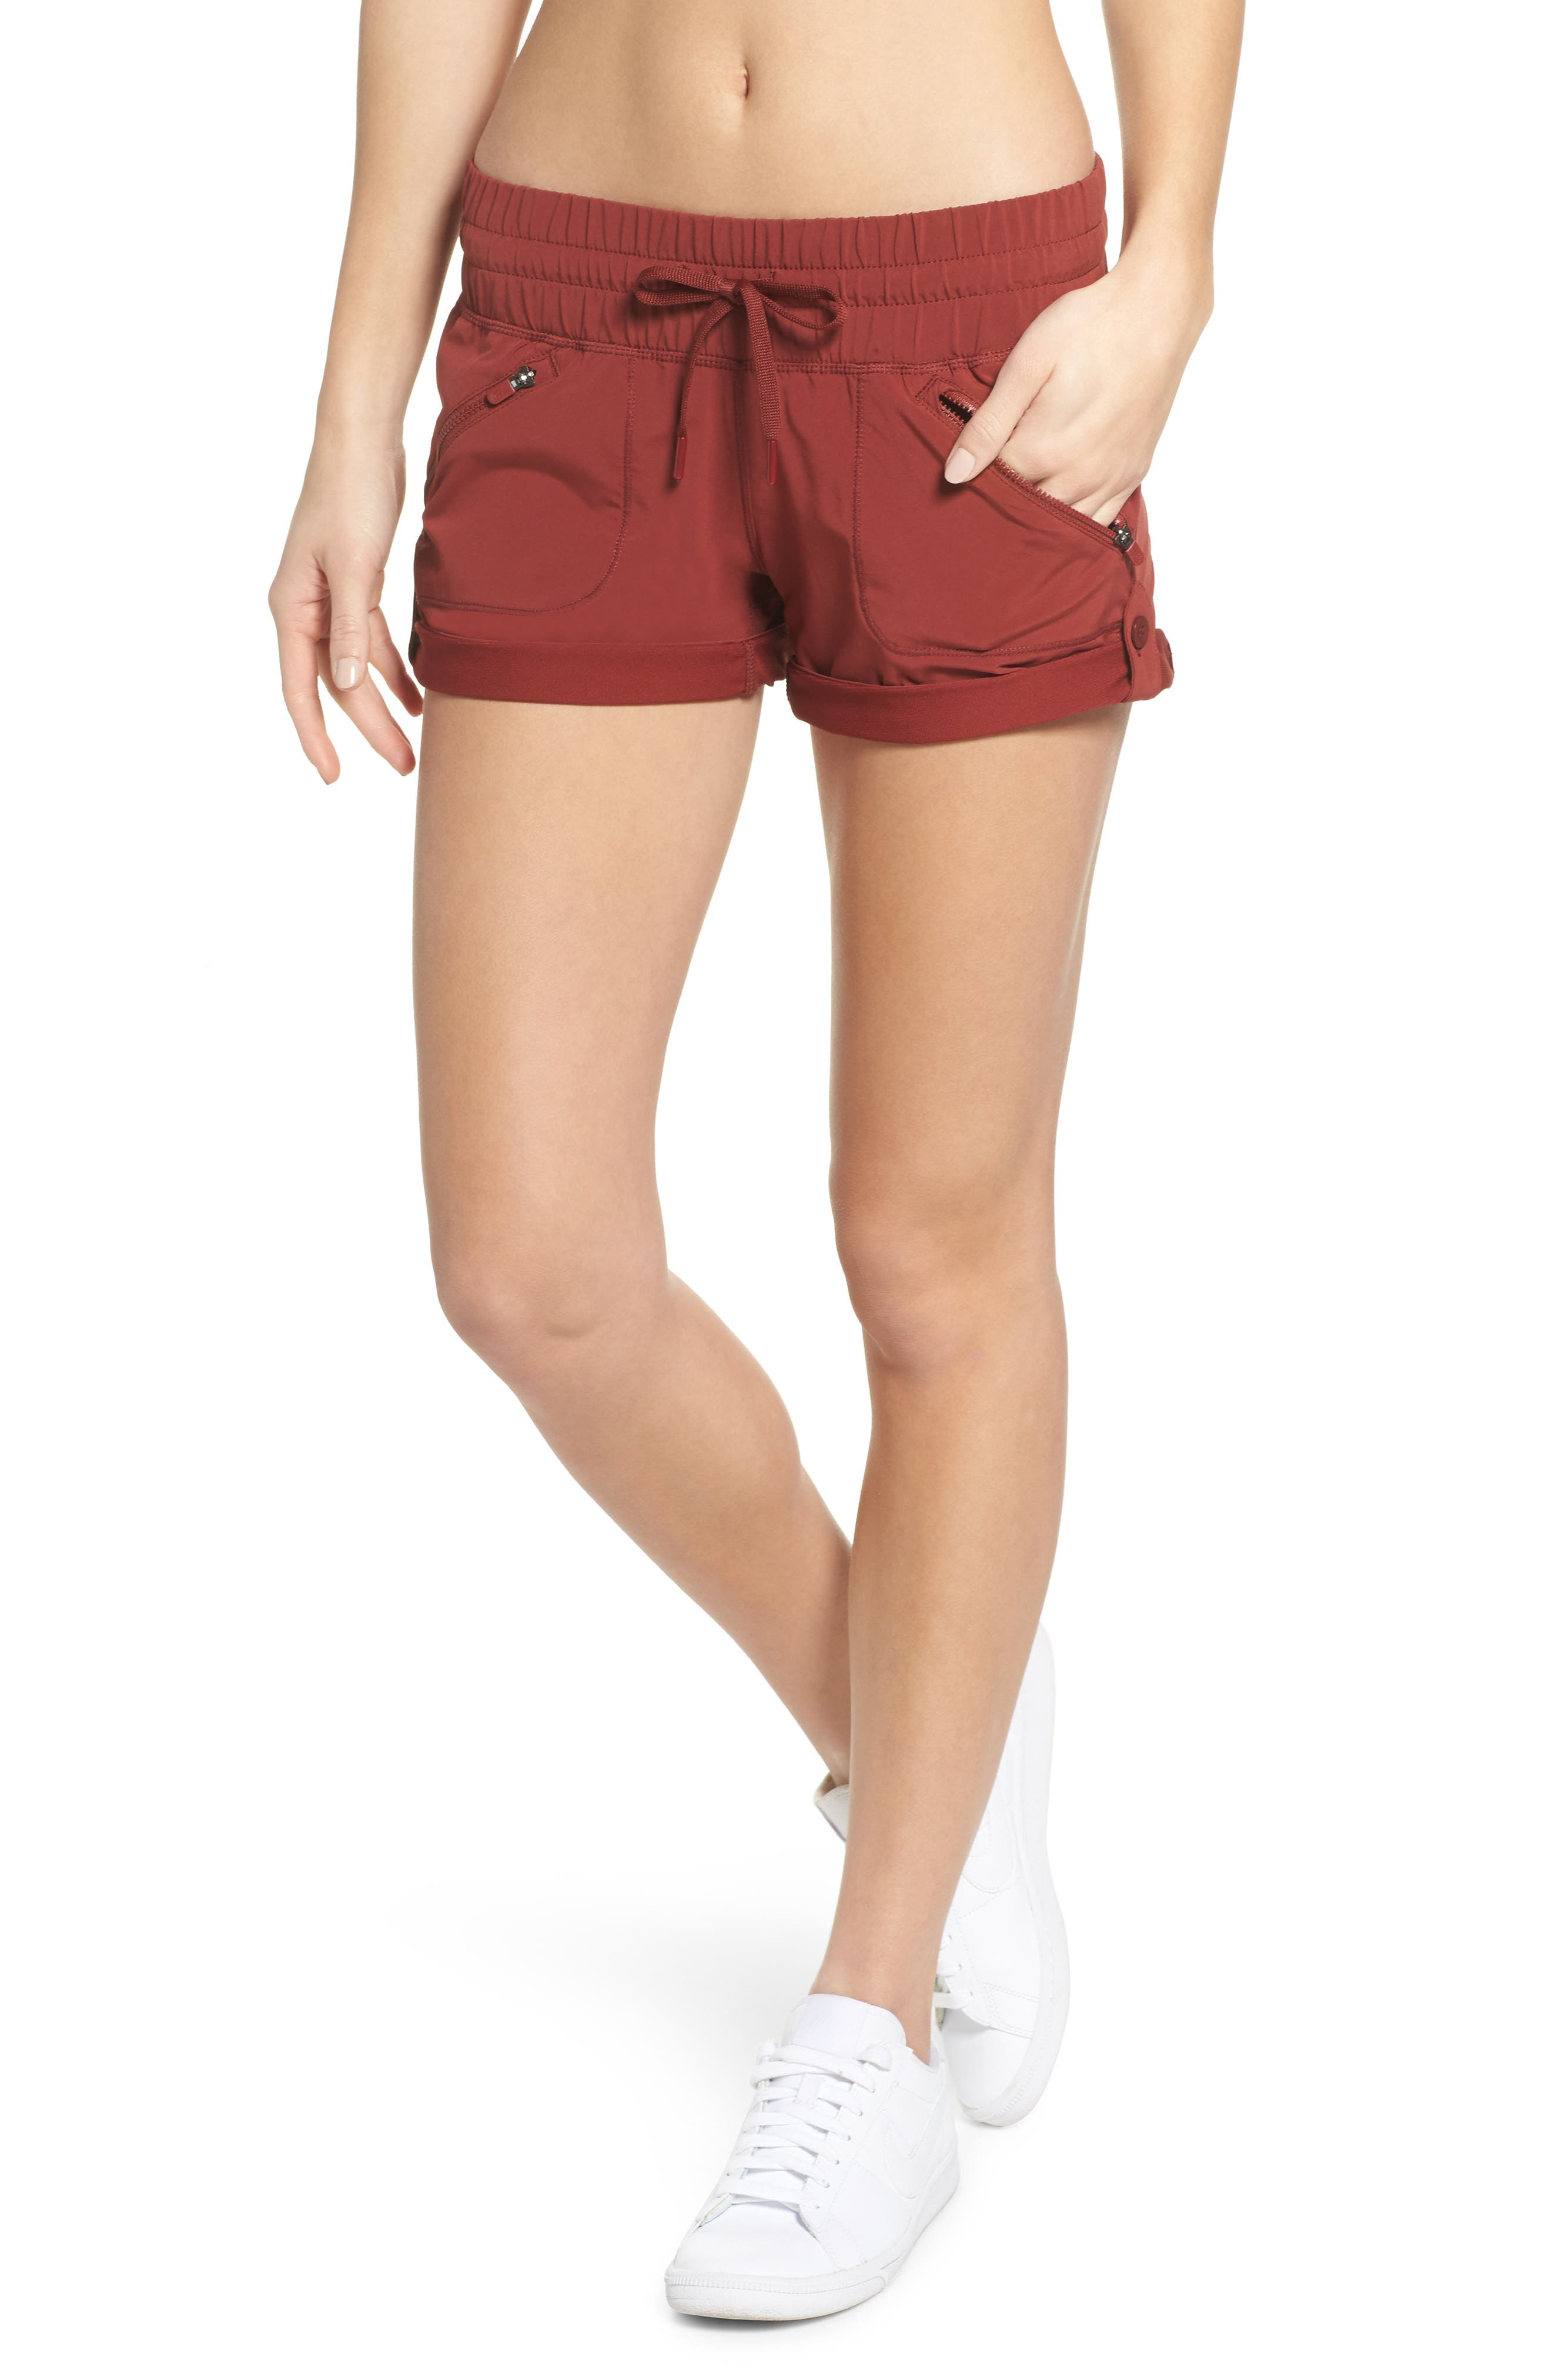 Switchback Shorts,                             Main thumbnail 1, color,                             210